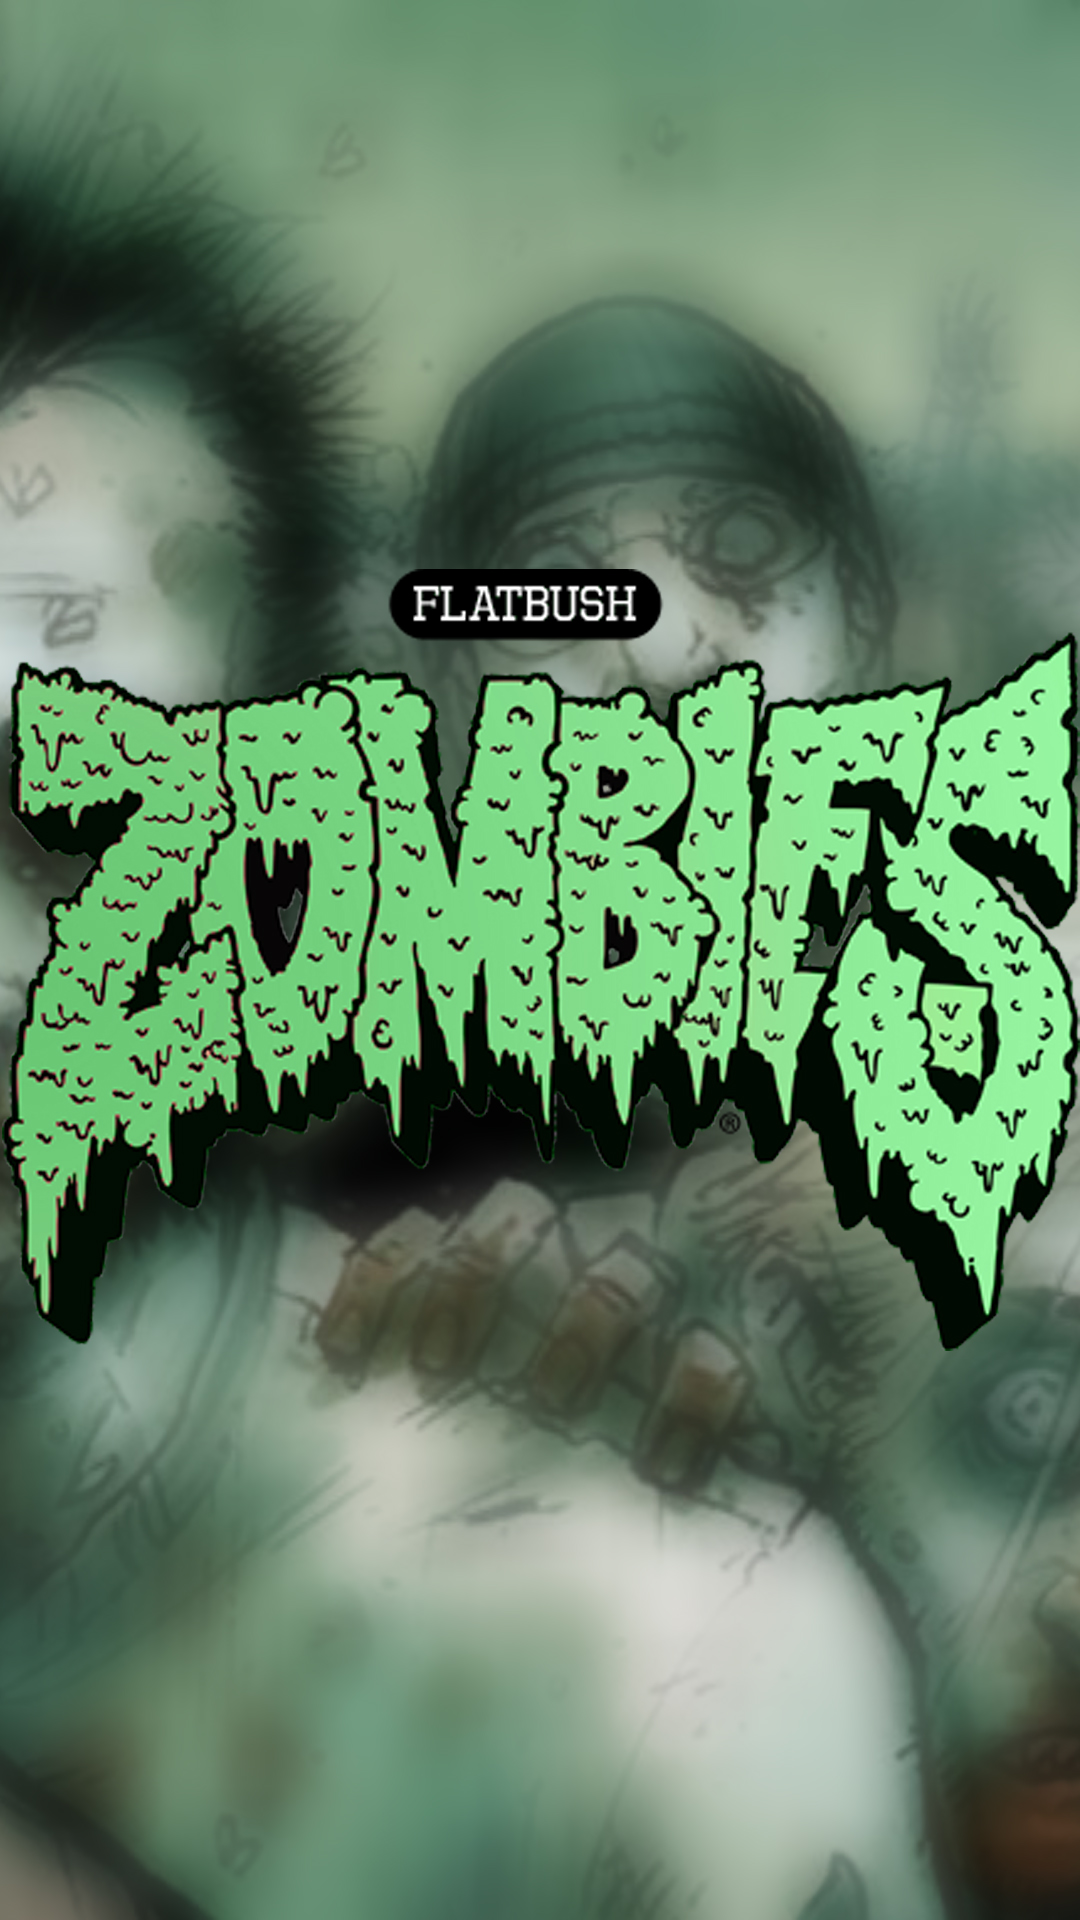 Flatbush Zombies Wallpaper - WallpaperSafari